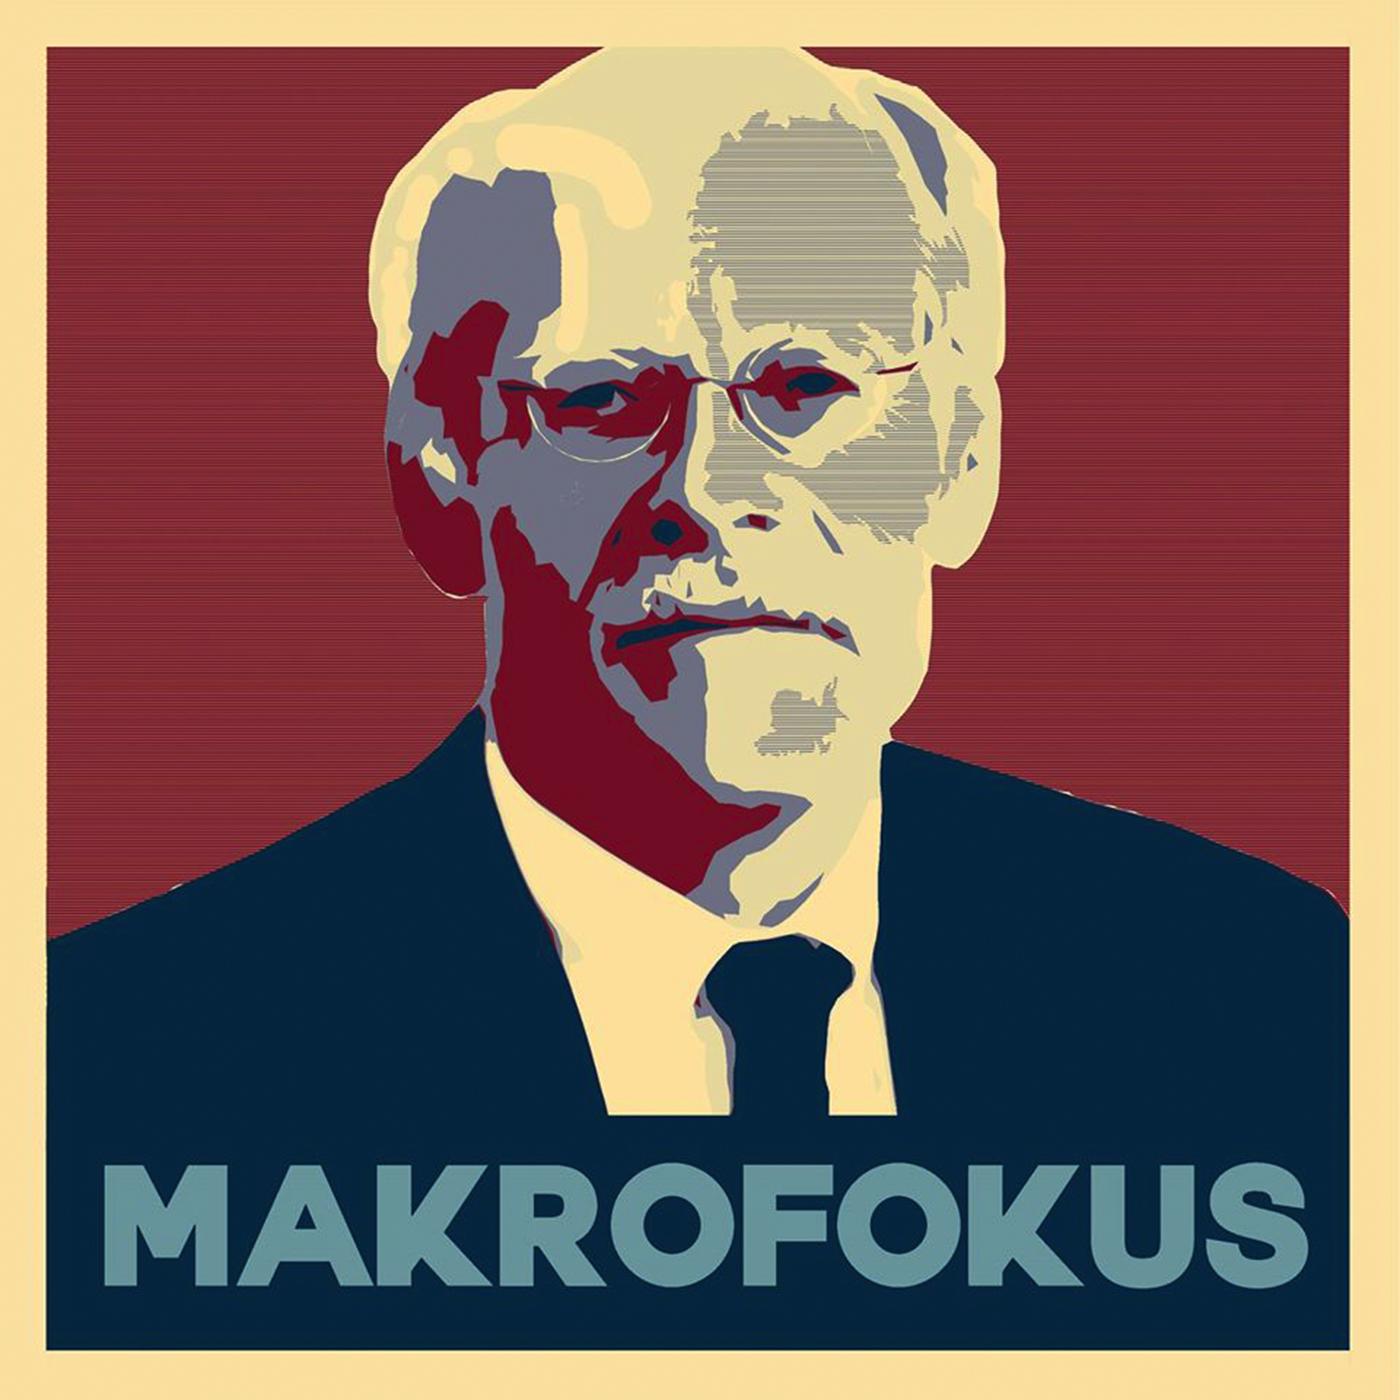 Makrofokus